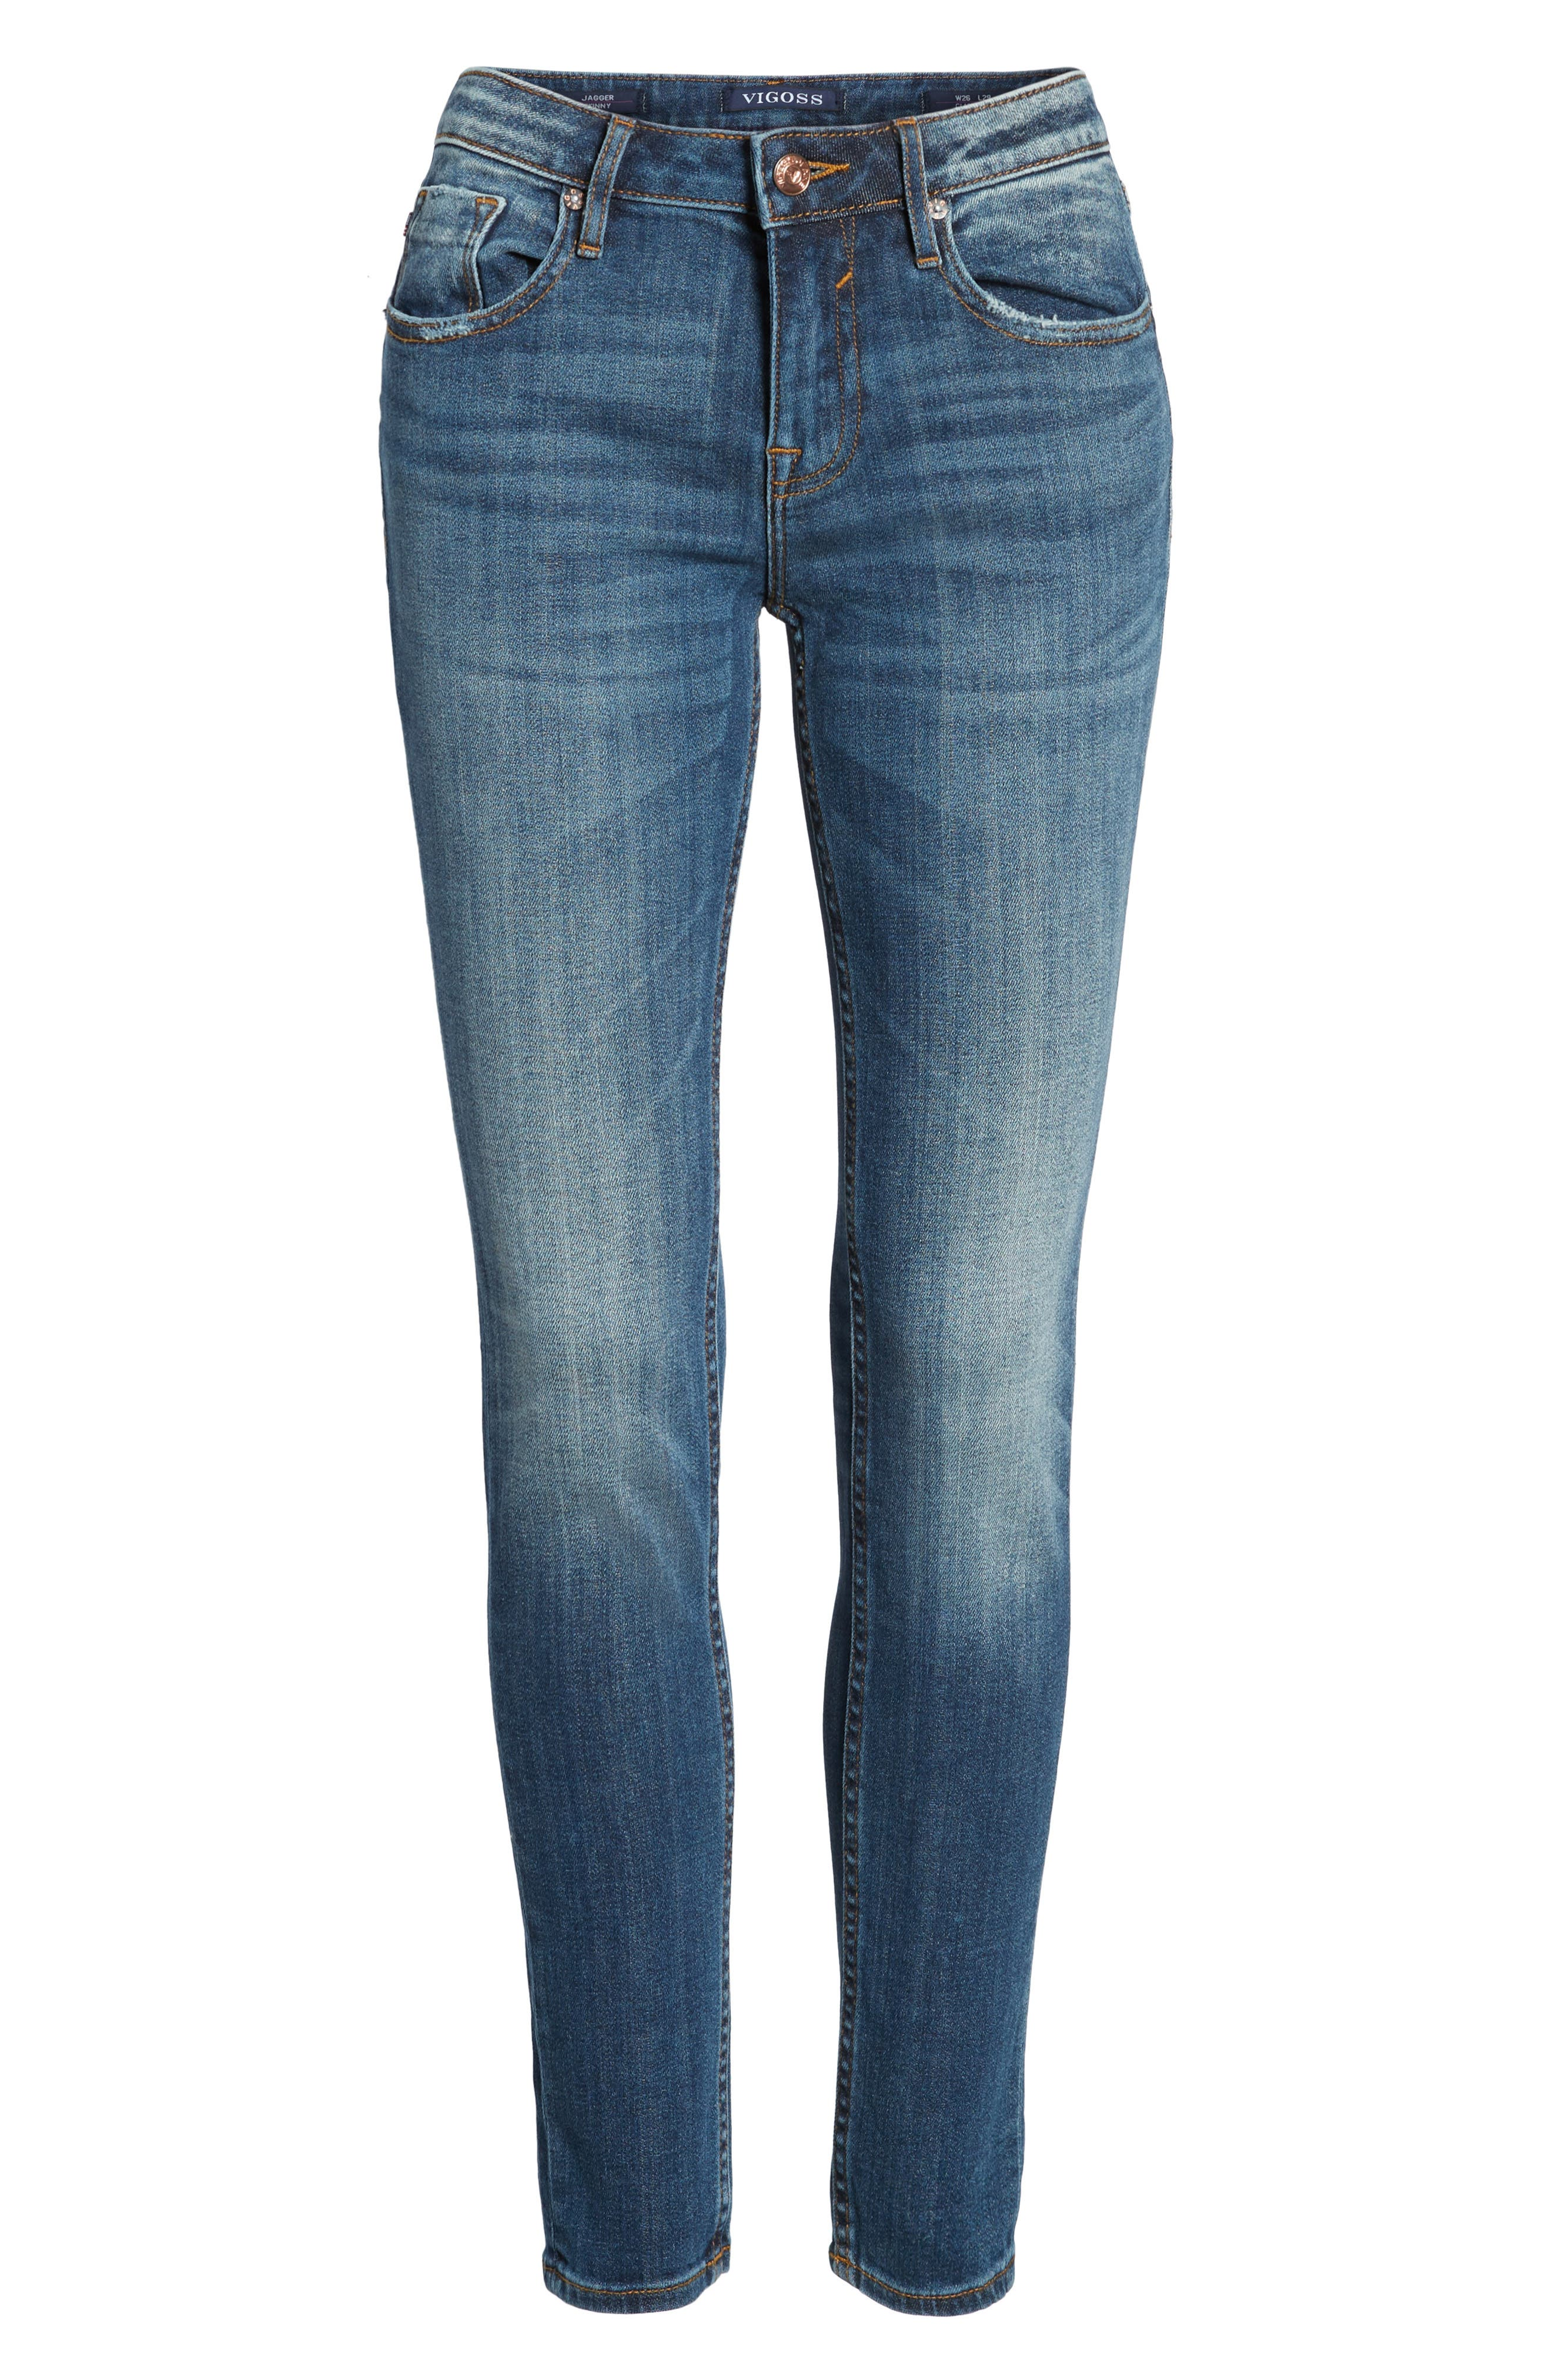 Jagger Skinny Jeans,                             Alternate thumbnail 7, color,